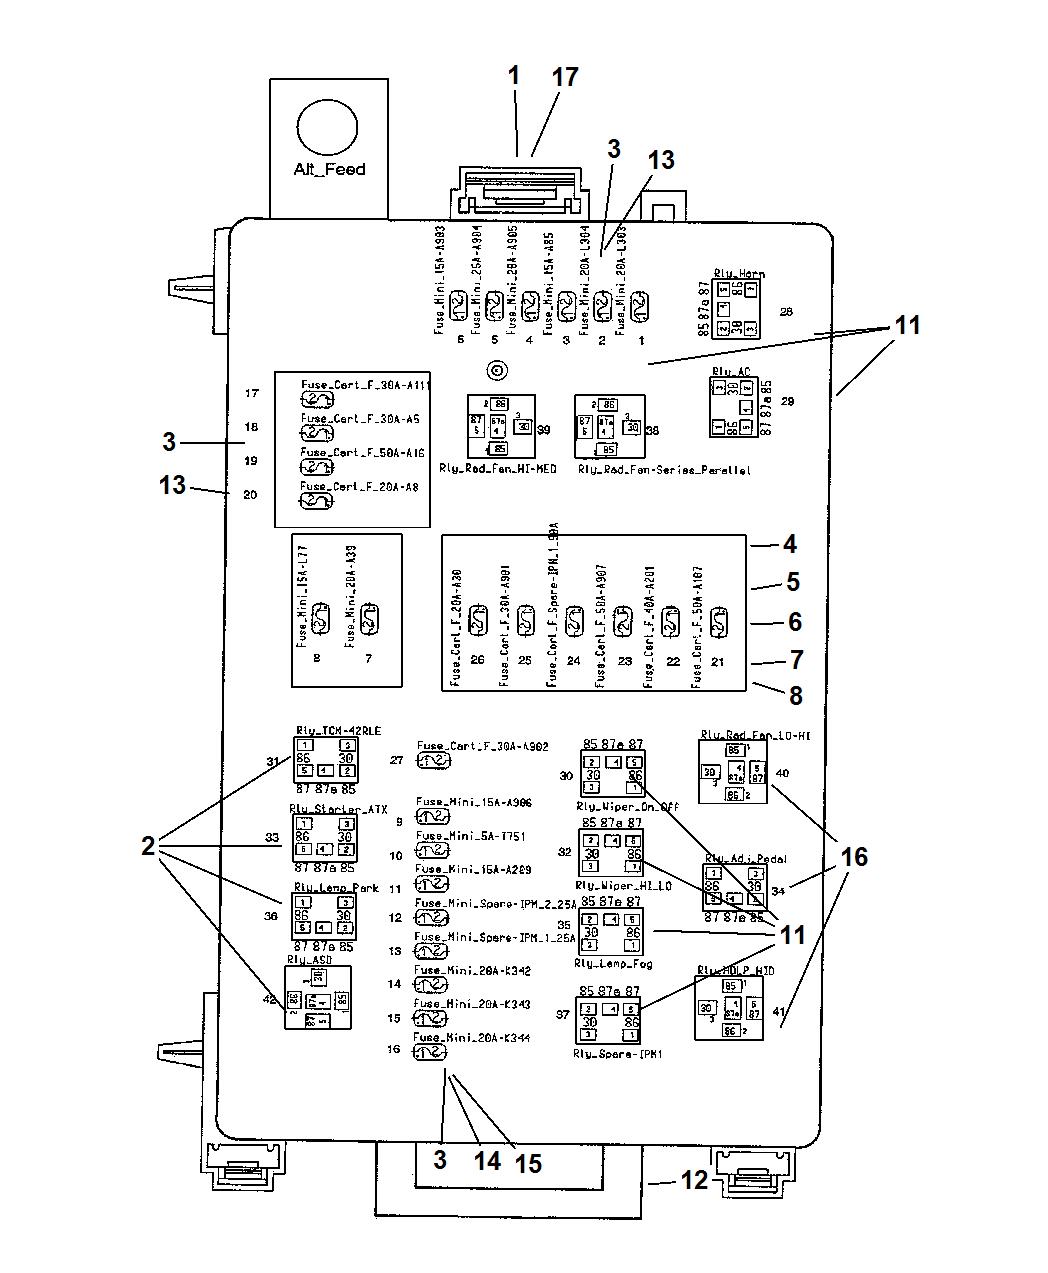 2006 dodge charger fuse diagram - center wiring diagram topic-housing -  topic-housing.iosonointersex.it  iosonointersex.it